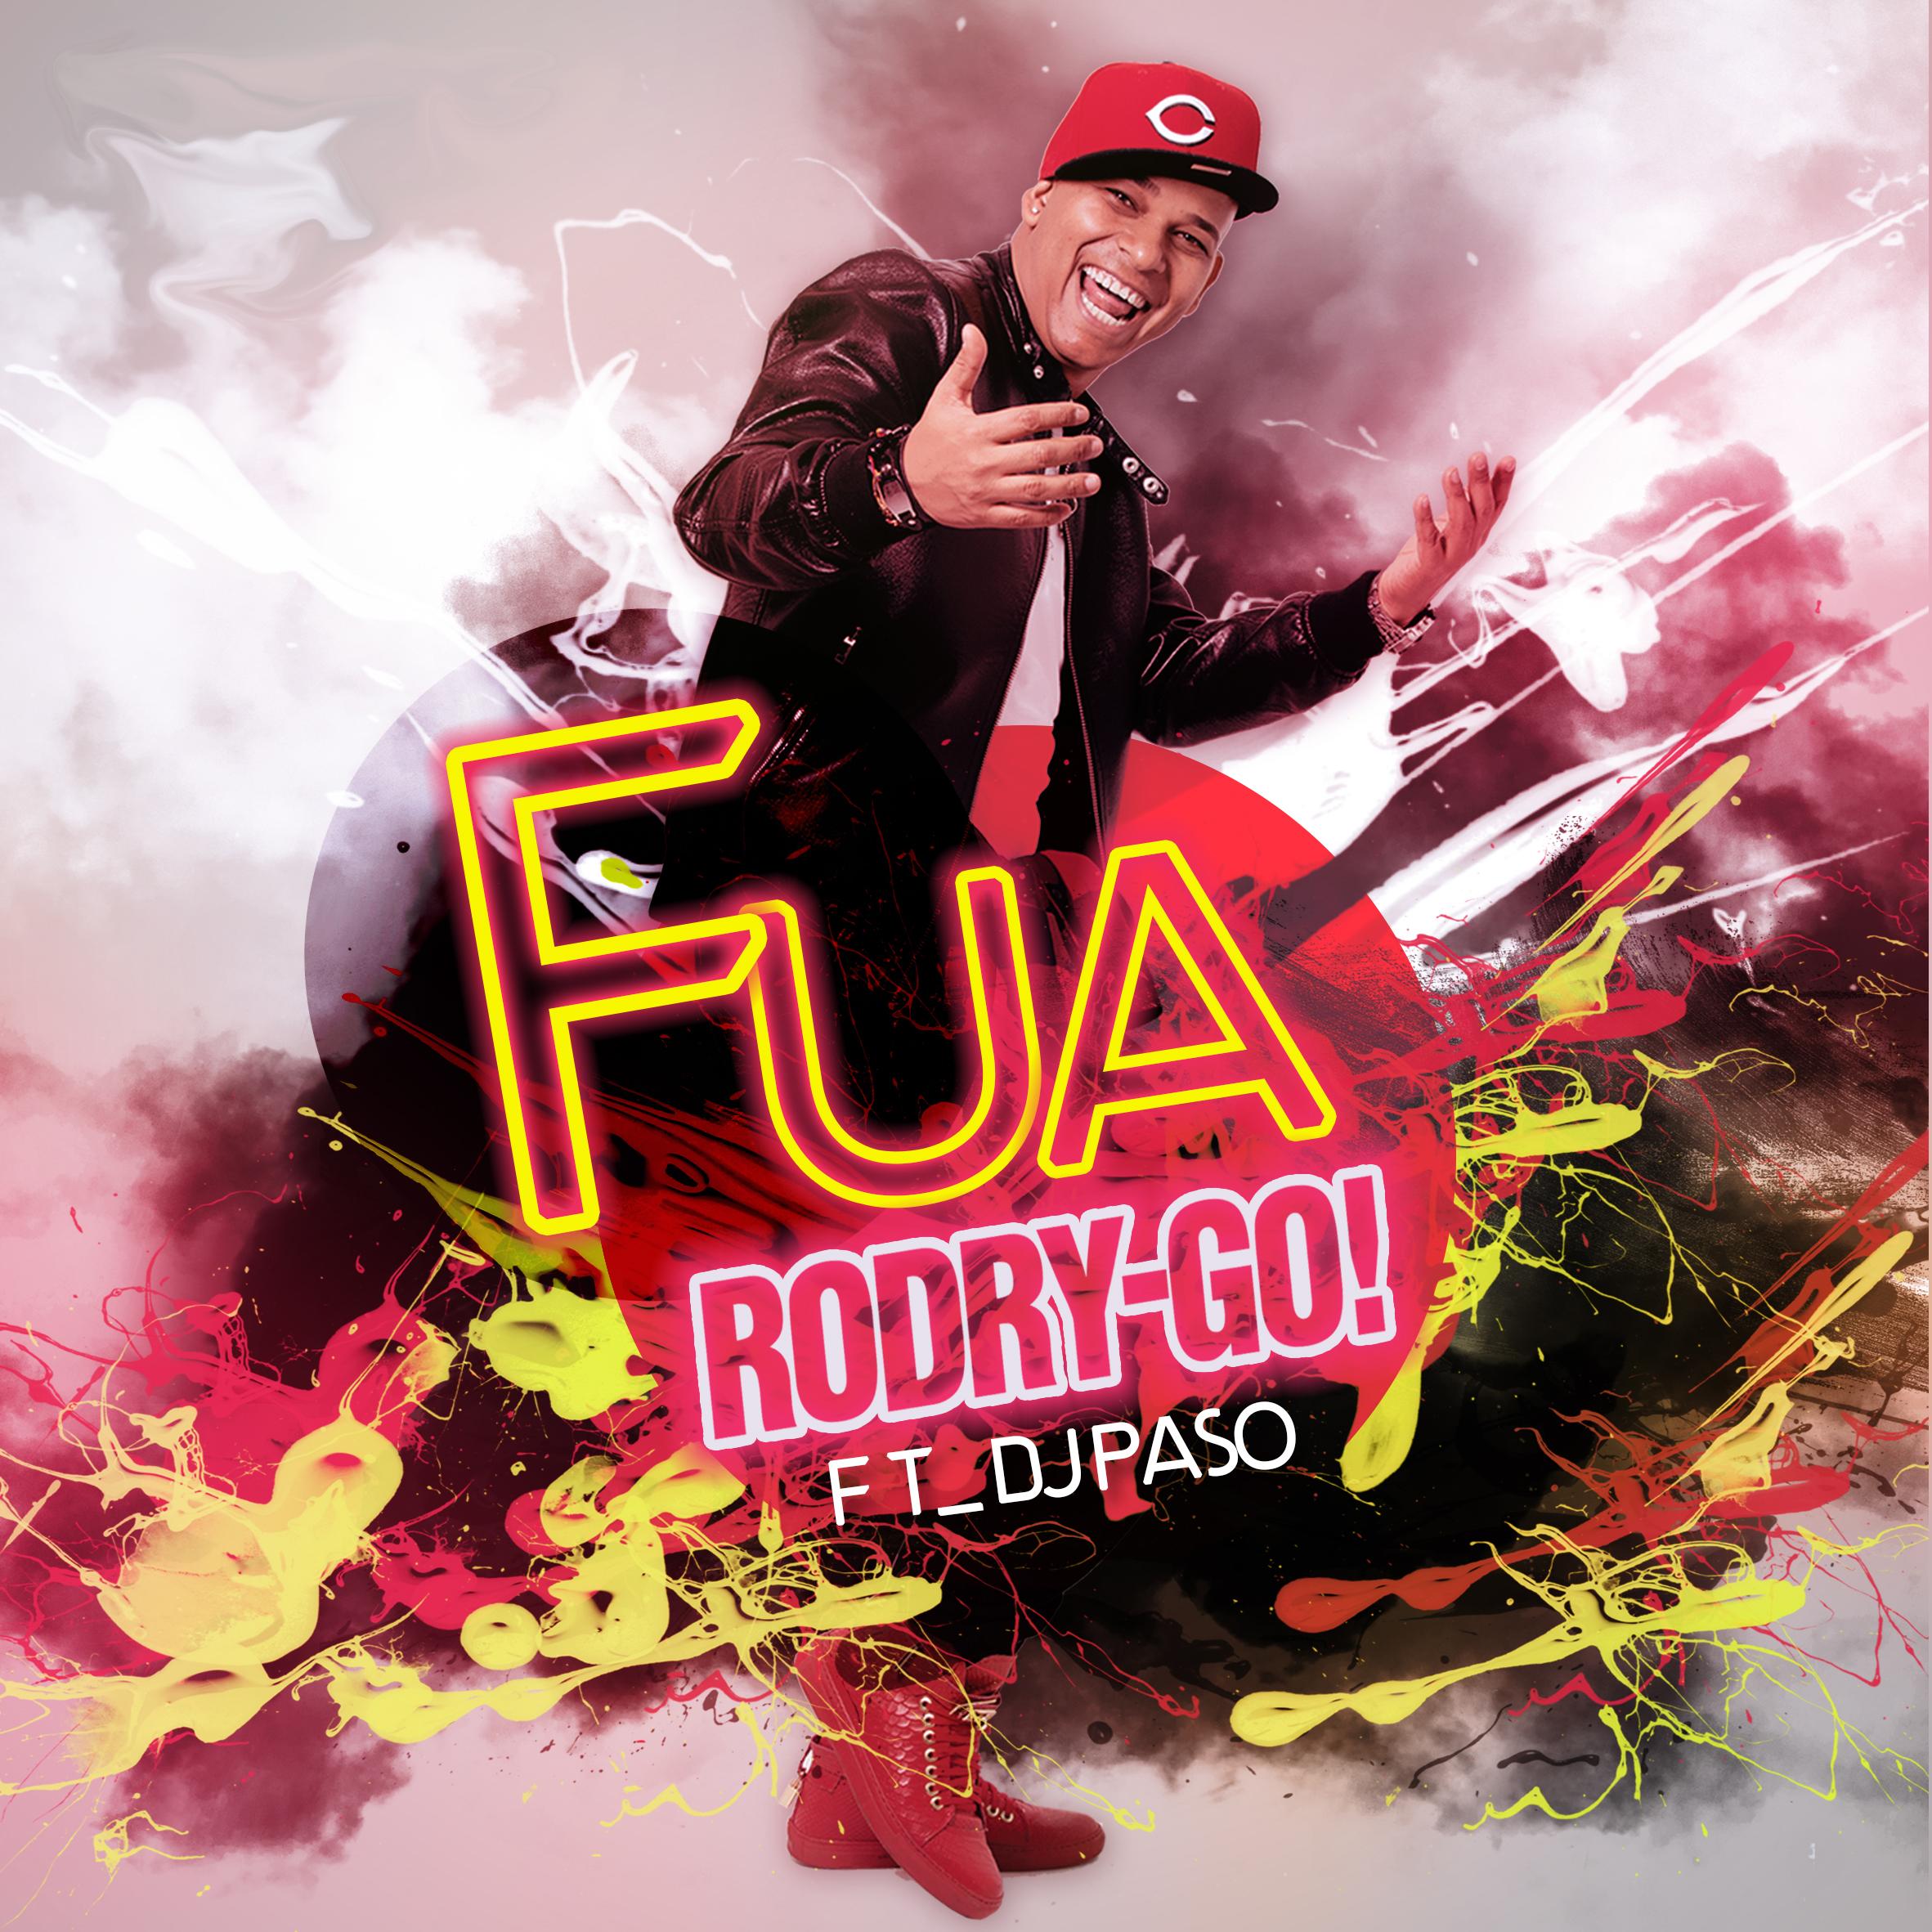 Rodry-Go Fua Cover 1